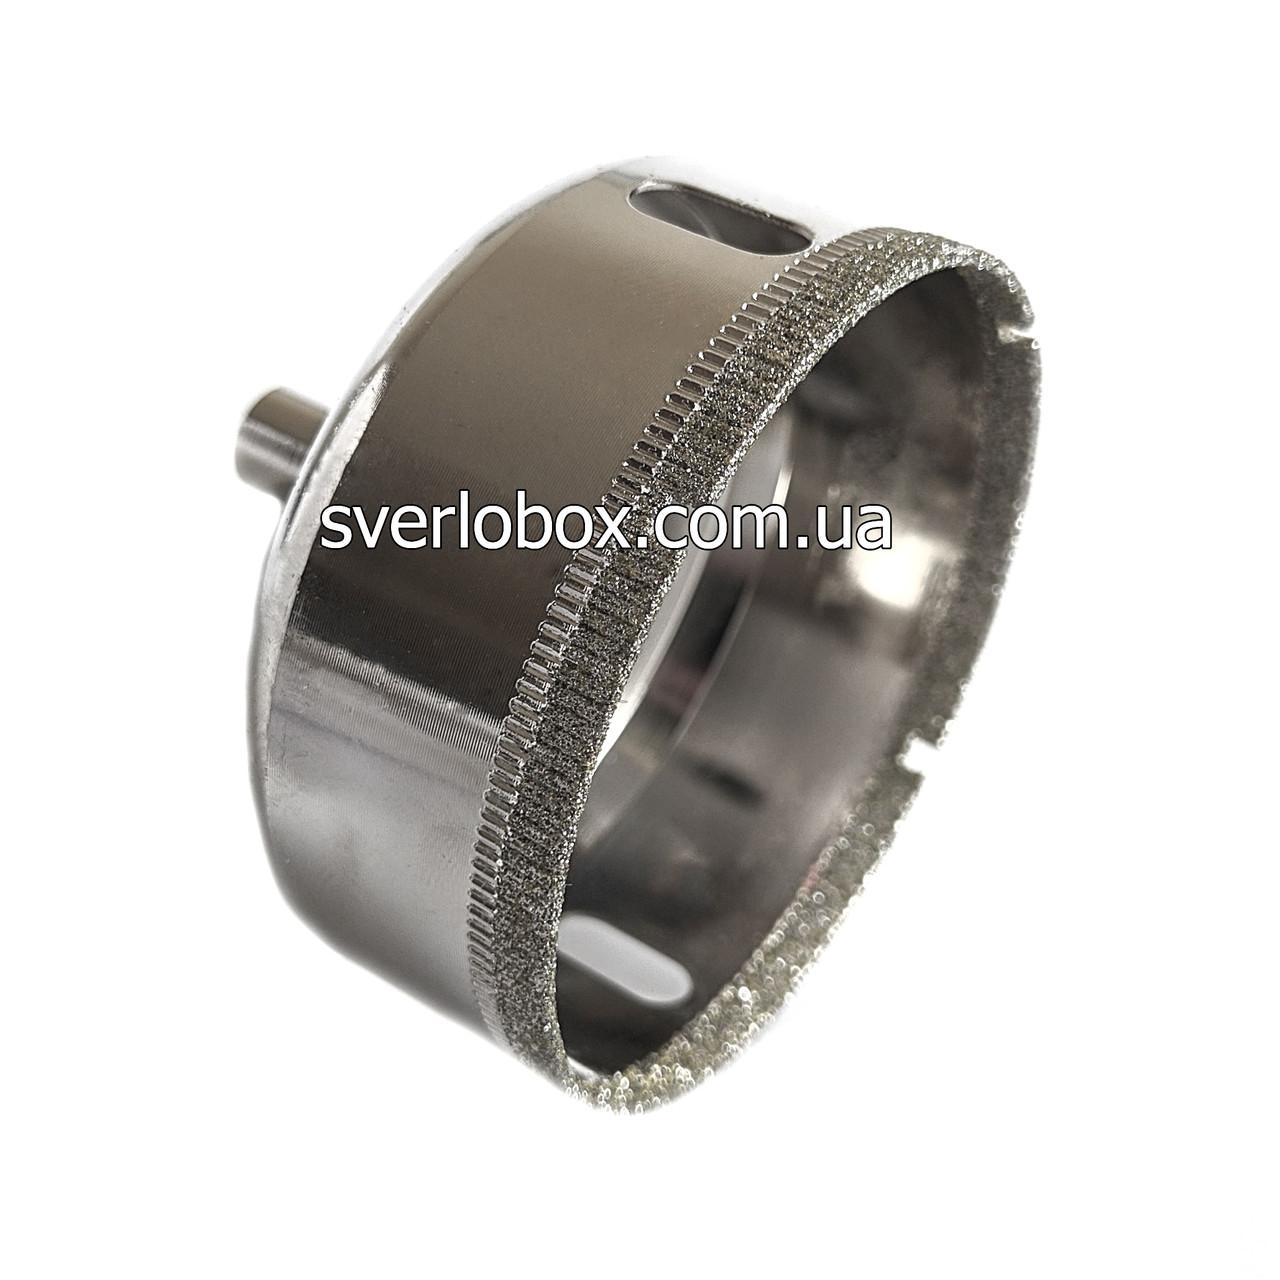 Коронка алмазная 10 мм